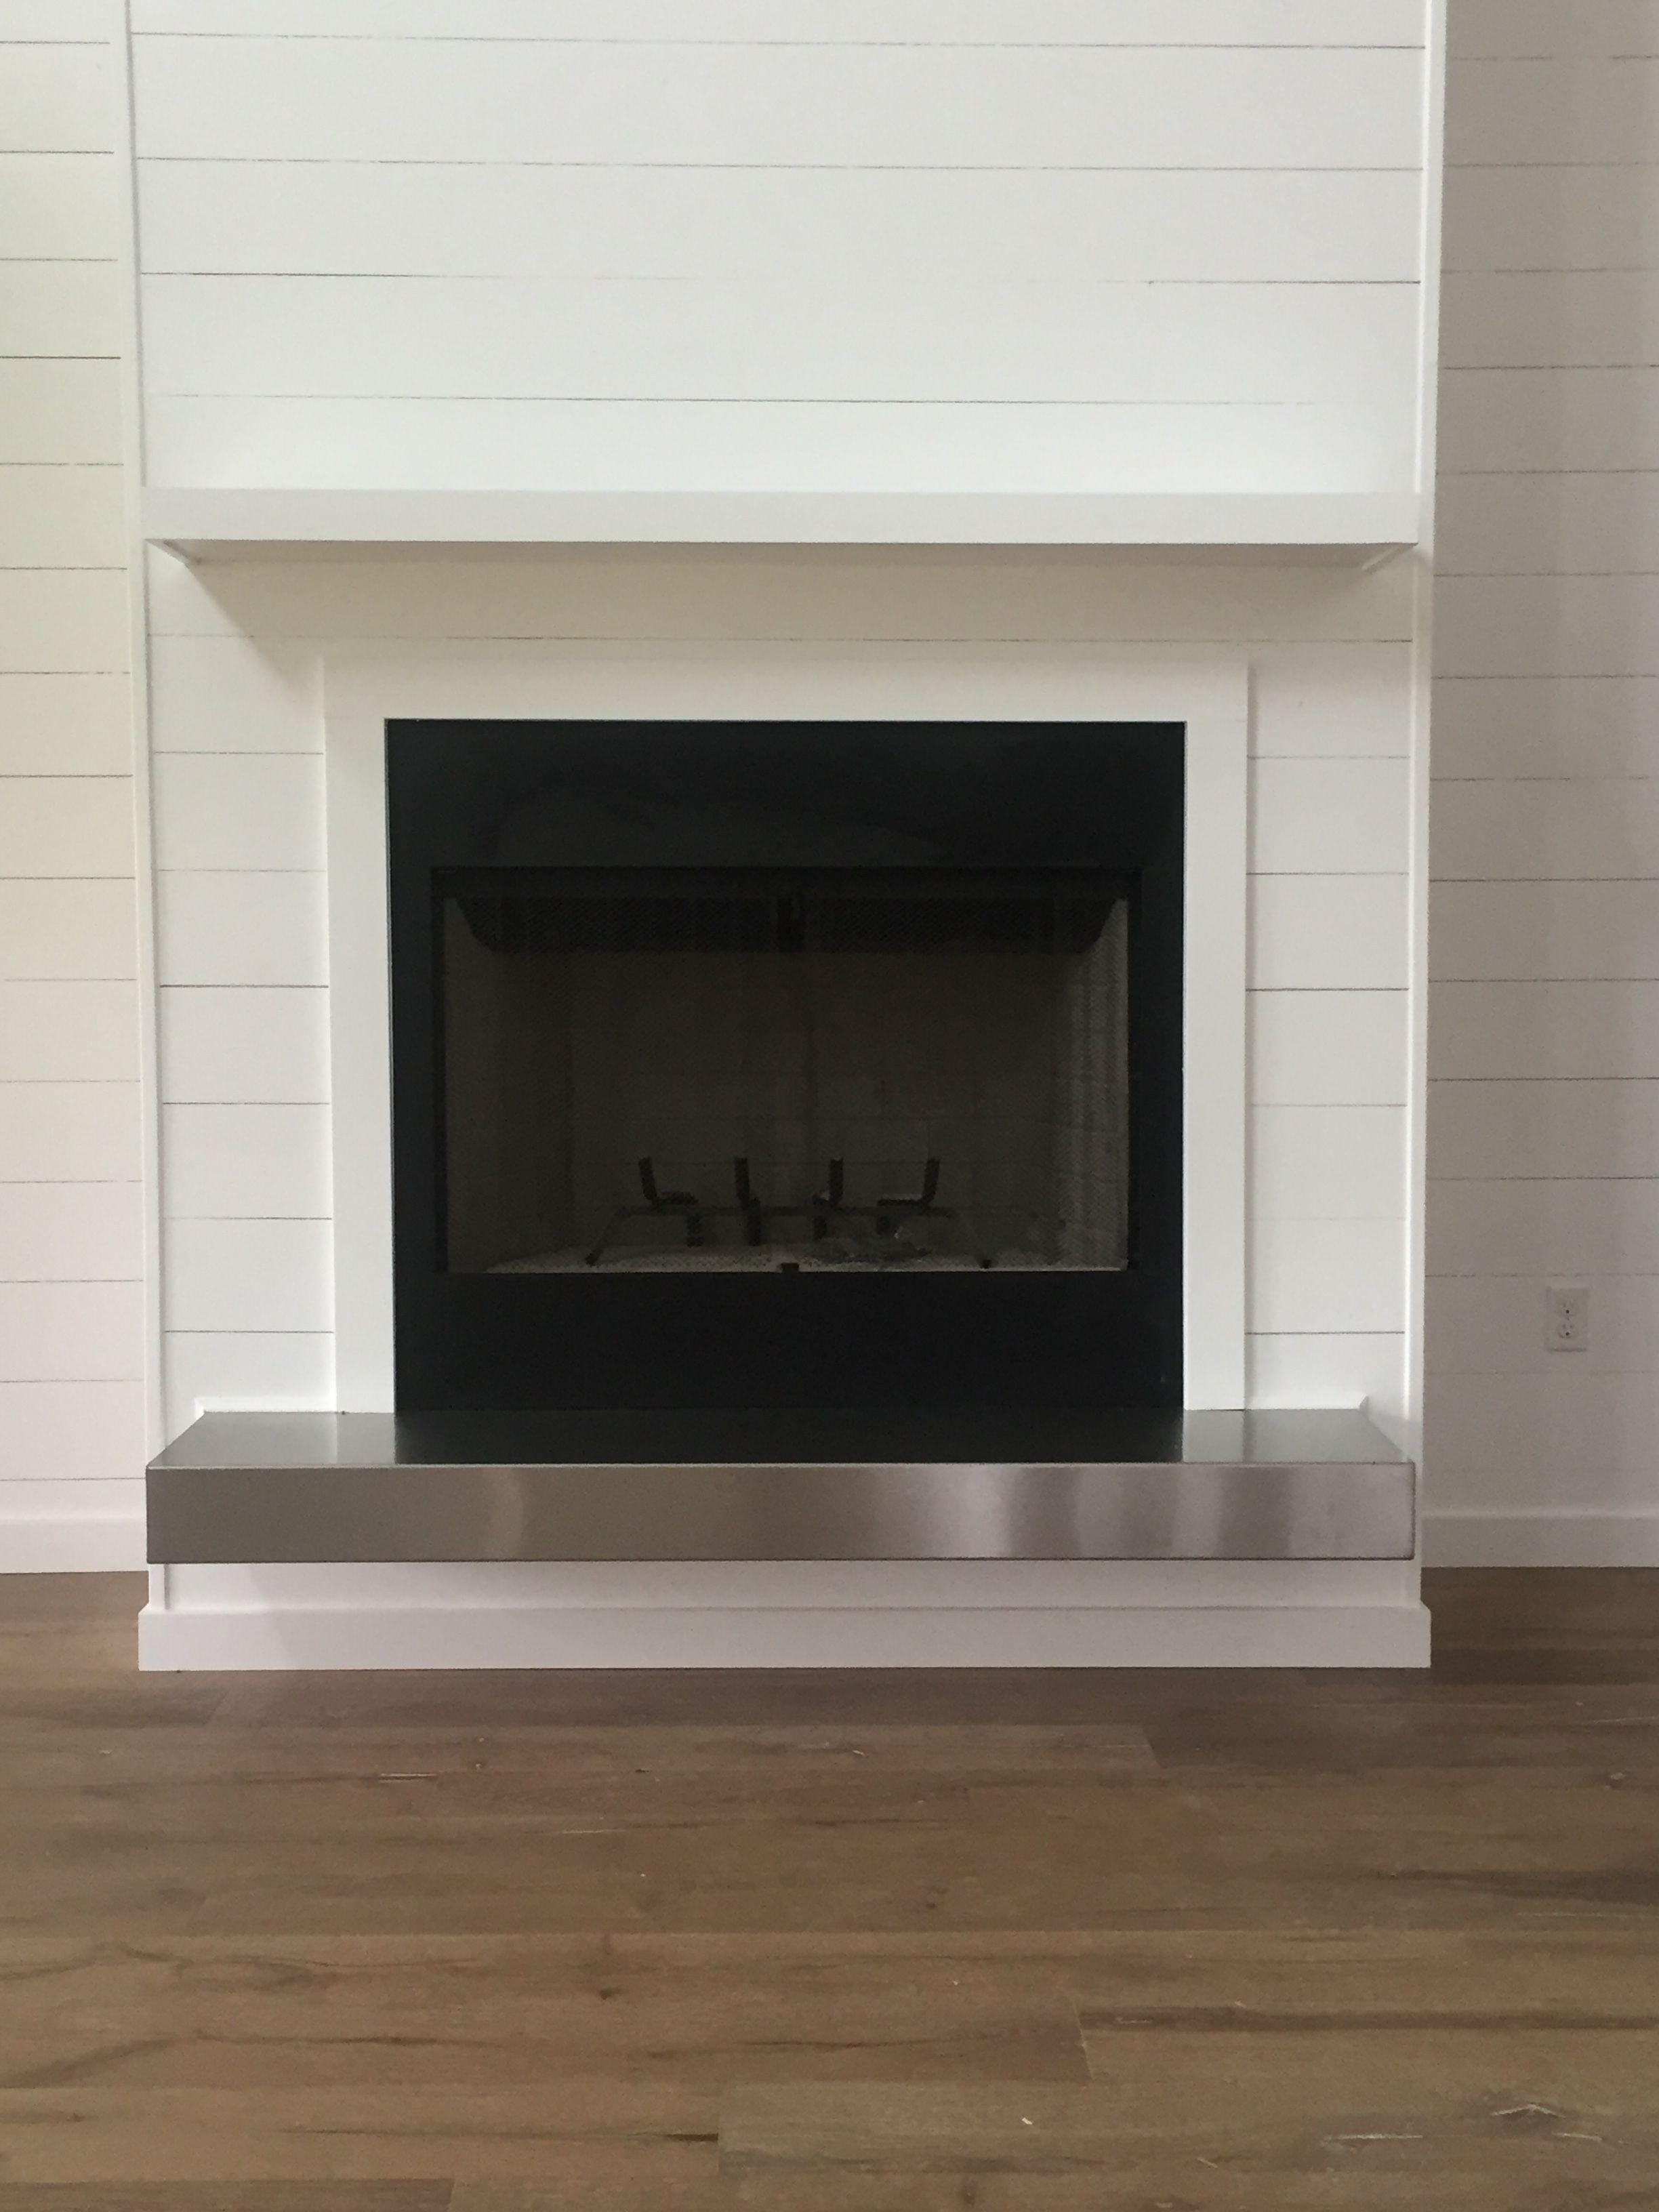 Shiplap Fireplace Add Reclaimed Wood Mantel No Silver Wood Fireplace Surrounds Diy Shiplap Fireplace Shiplap Fireplace